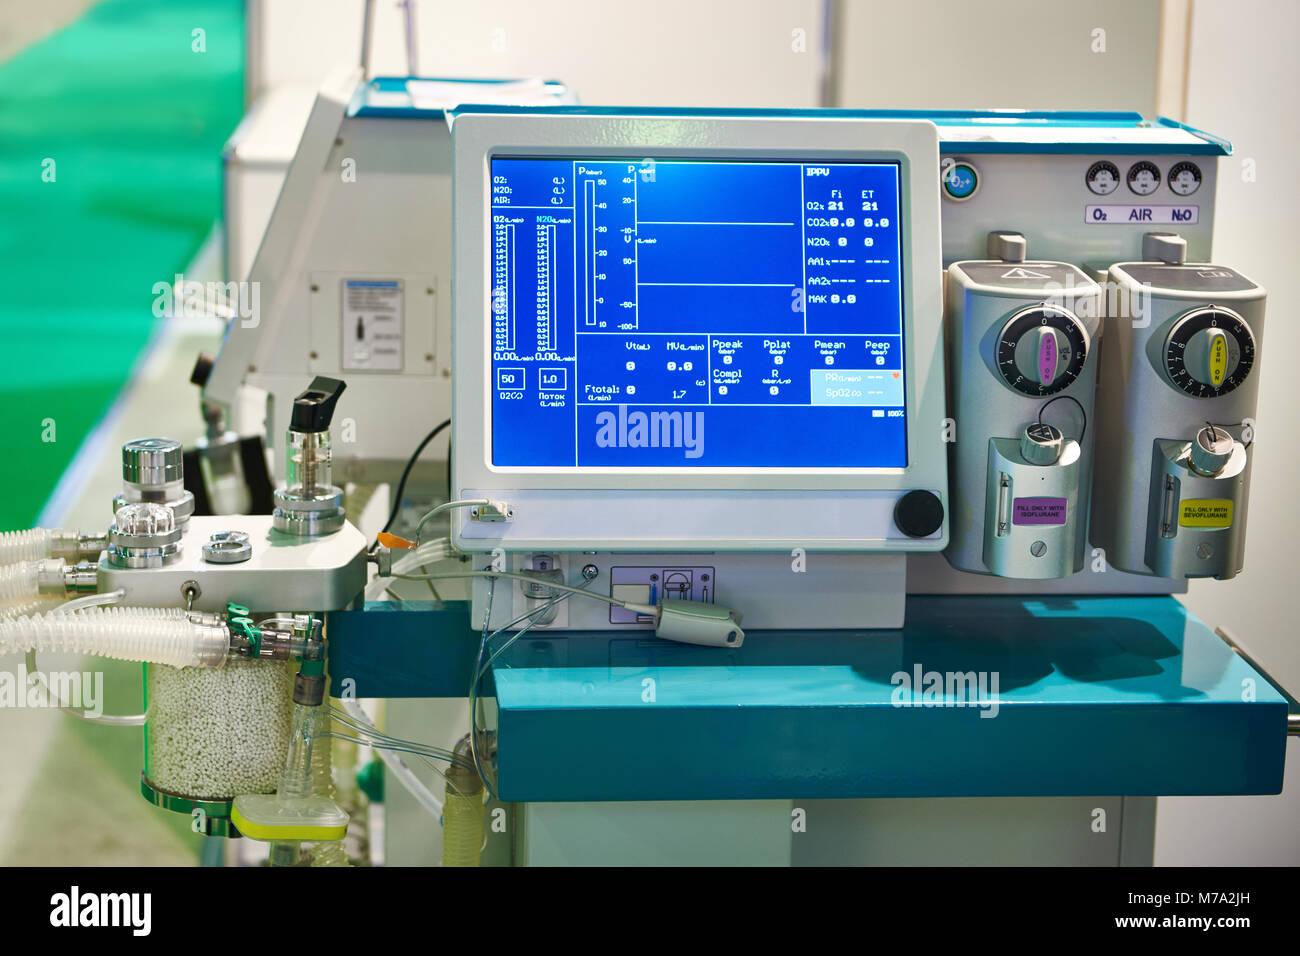 Inhalation anaesthetic machine with monitor - Stock Image